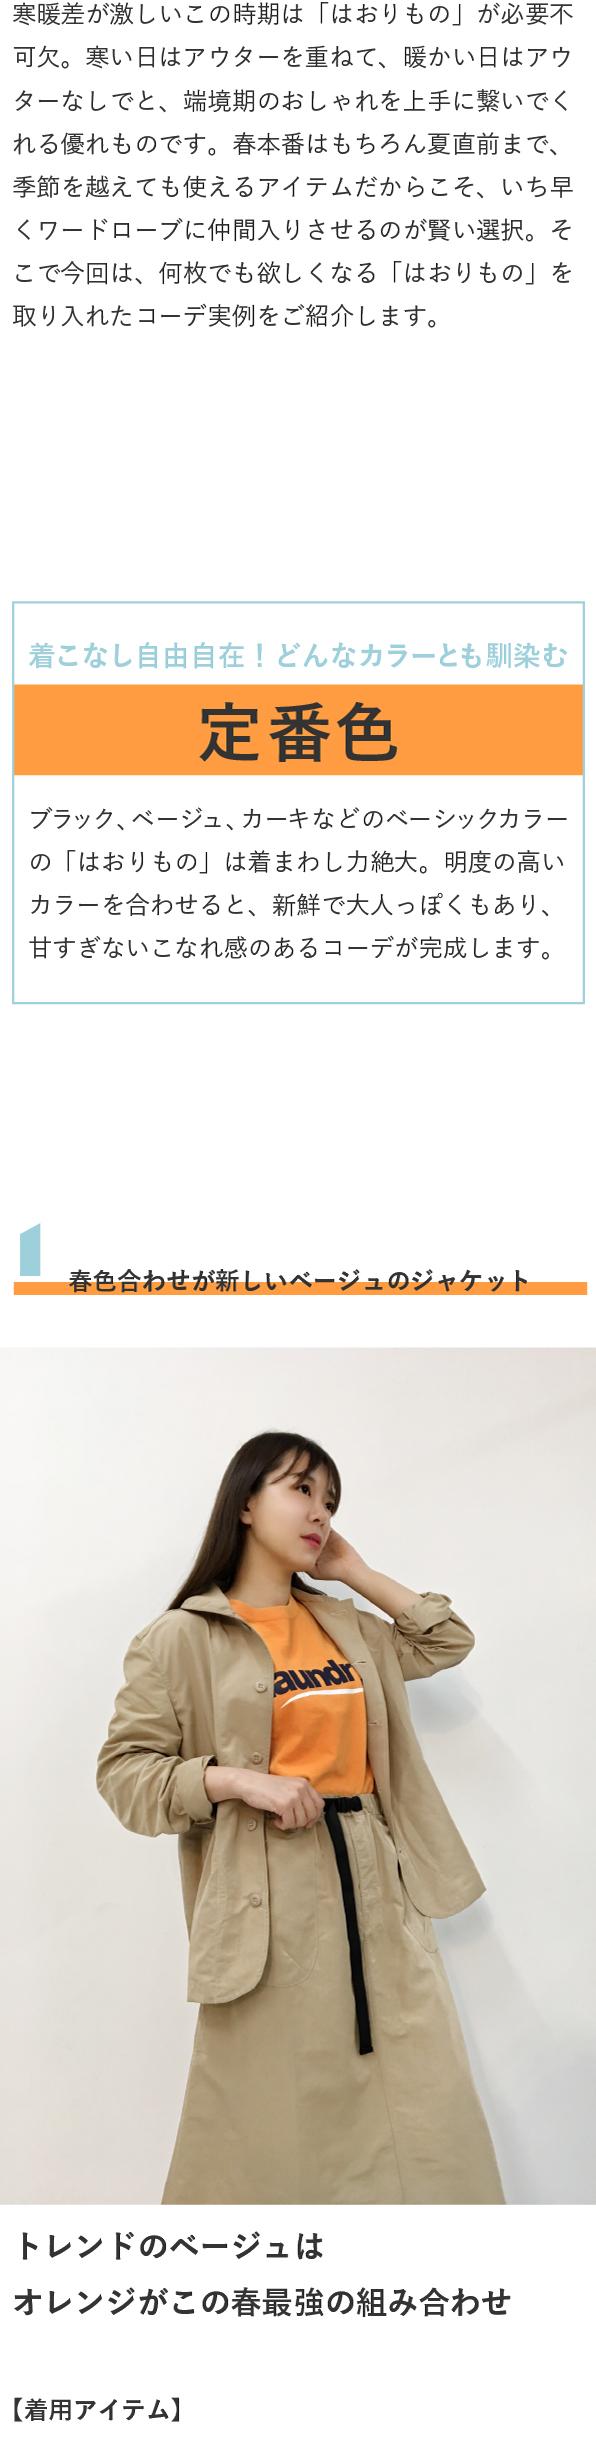 0303haori-001-596